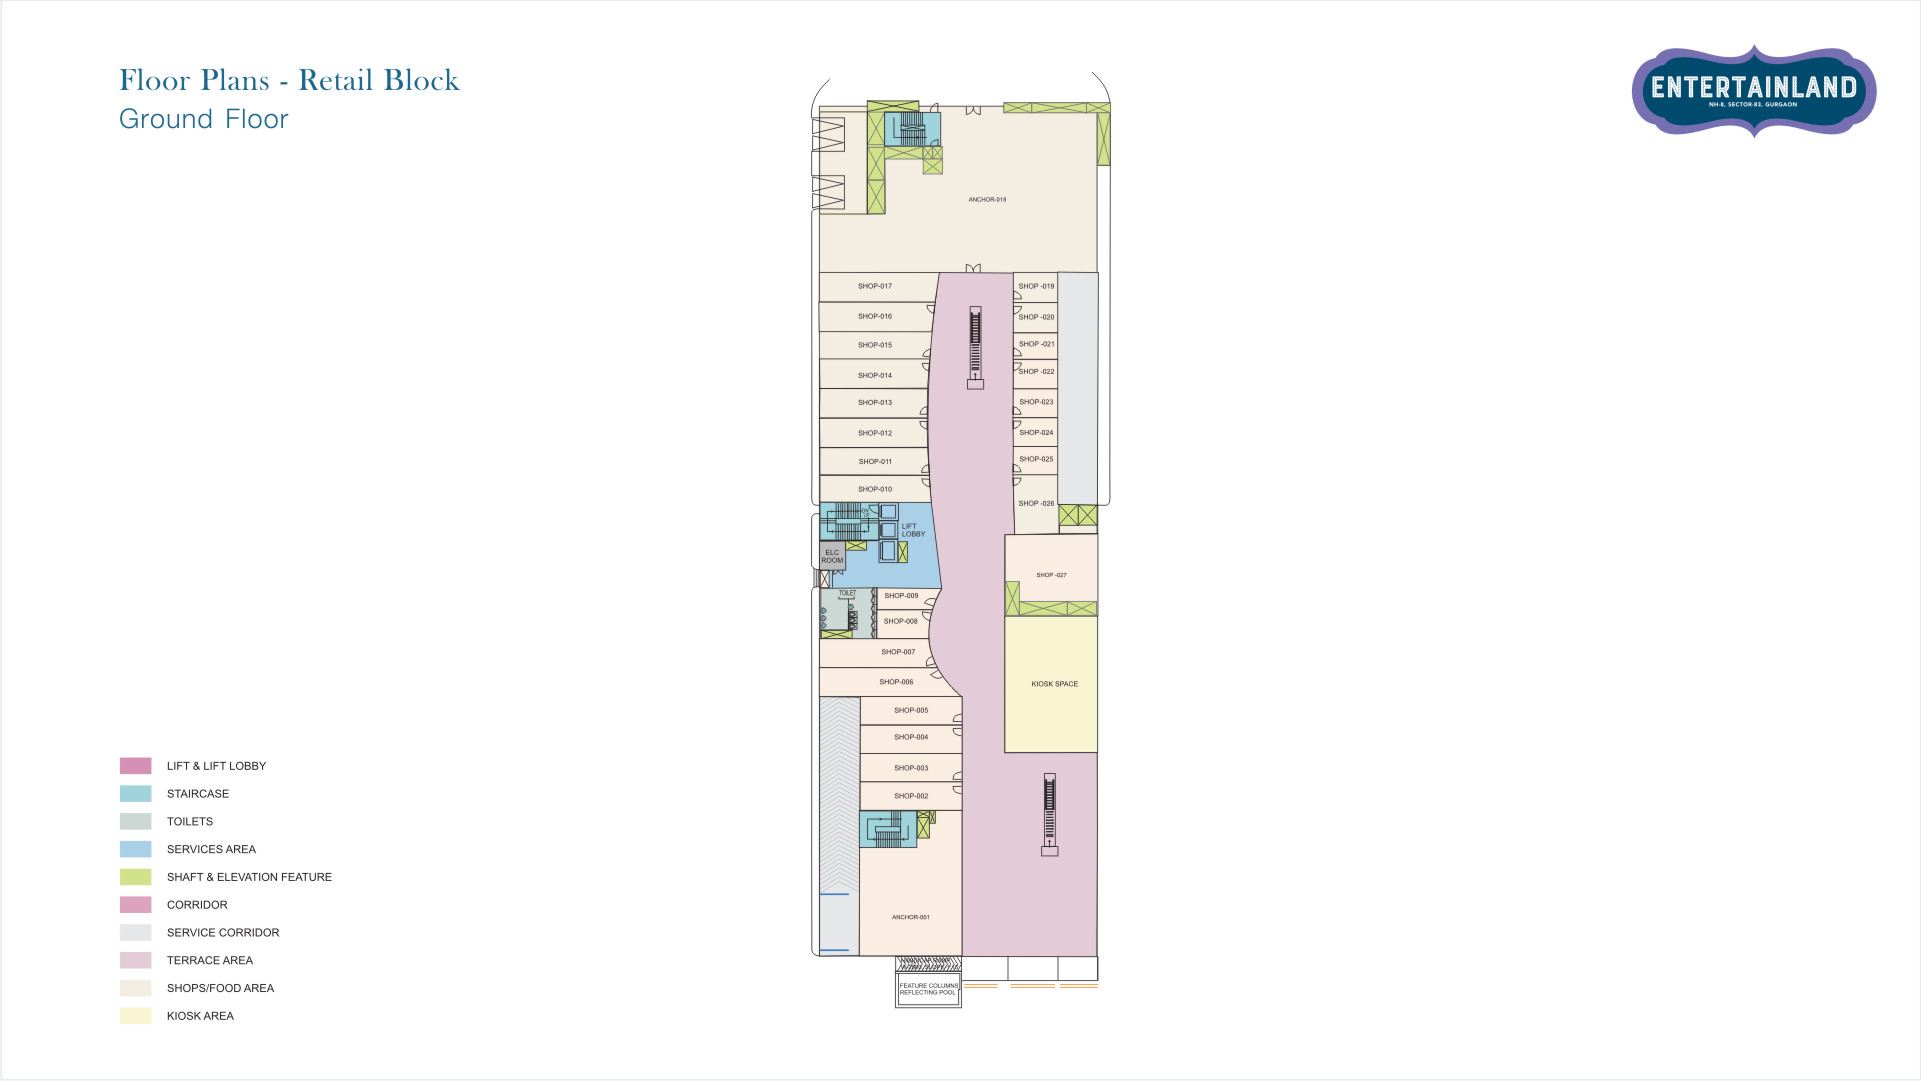 Entertainland Floor Plan 2